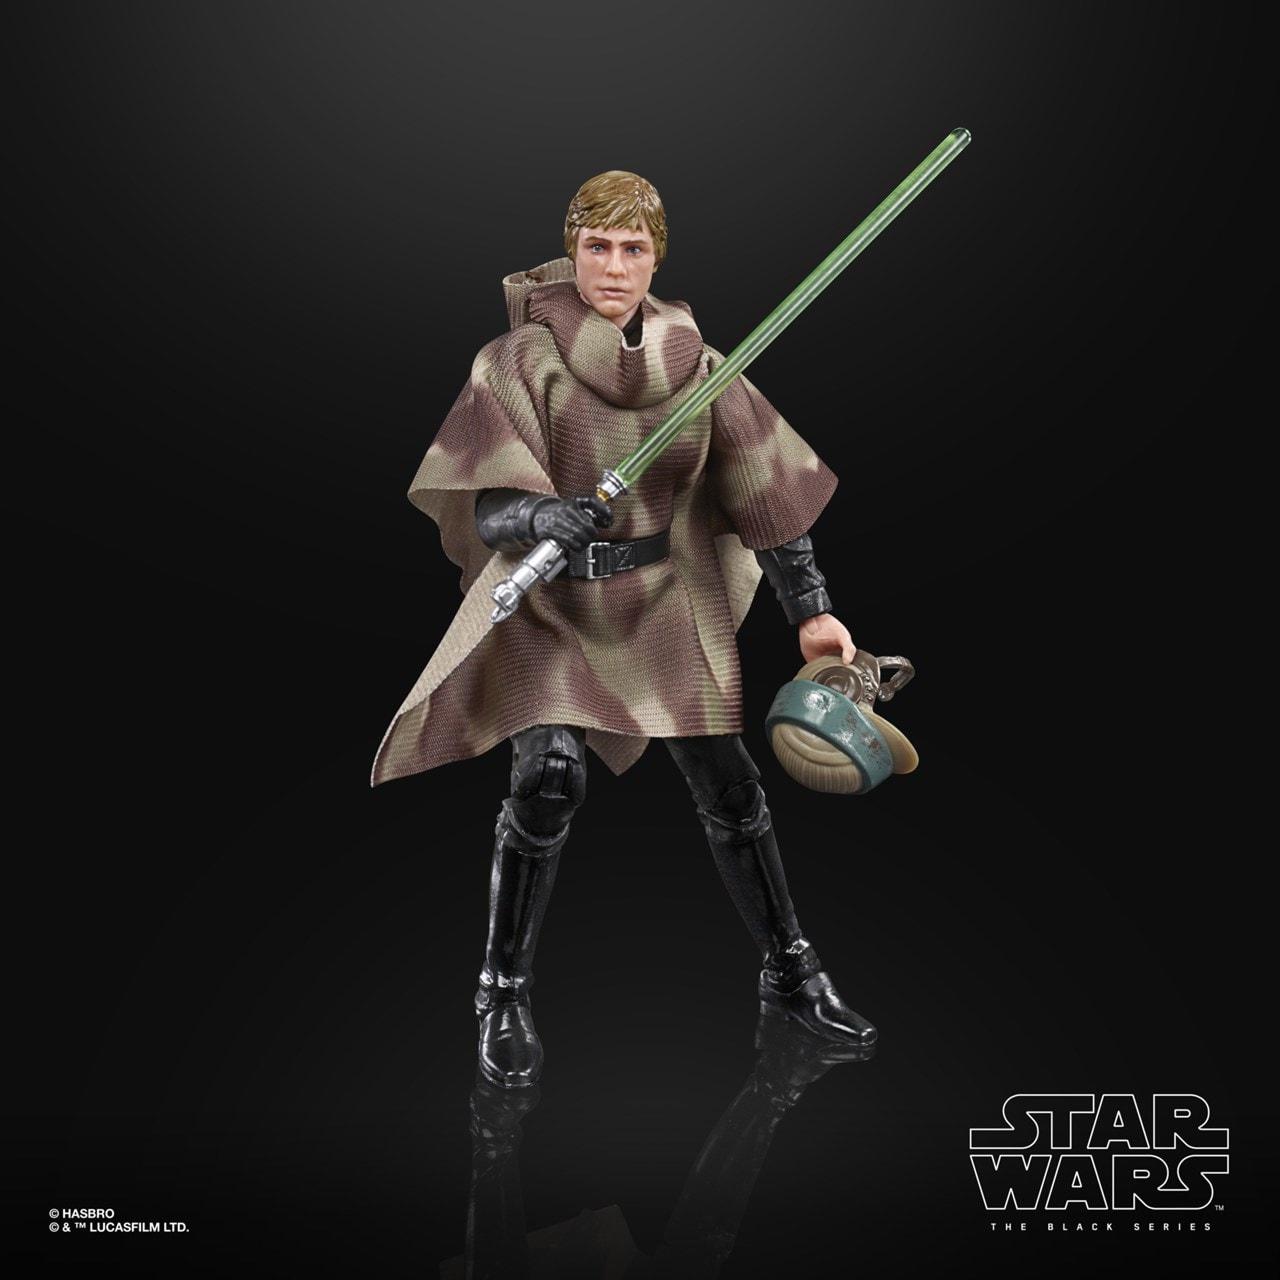 Luke Skywalker: Episode 6: The Black Series: Star Wars Action Figure - 2